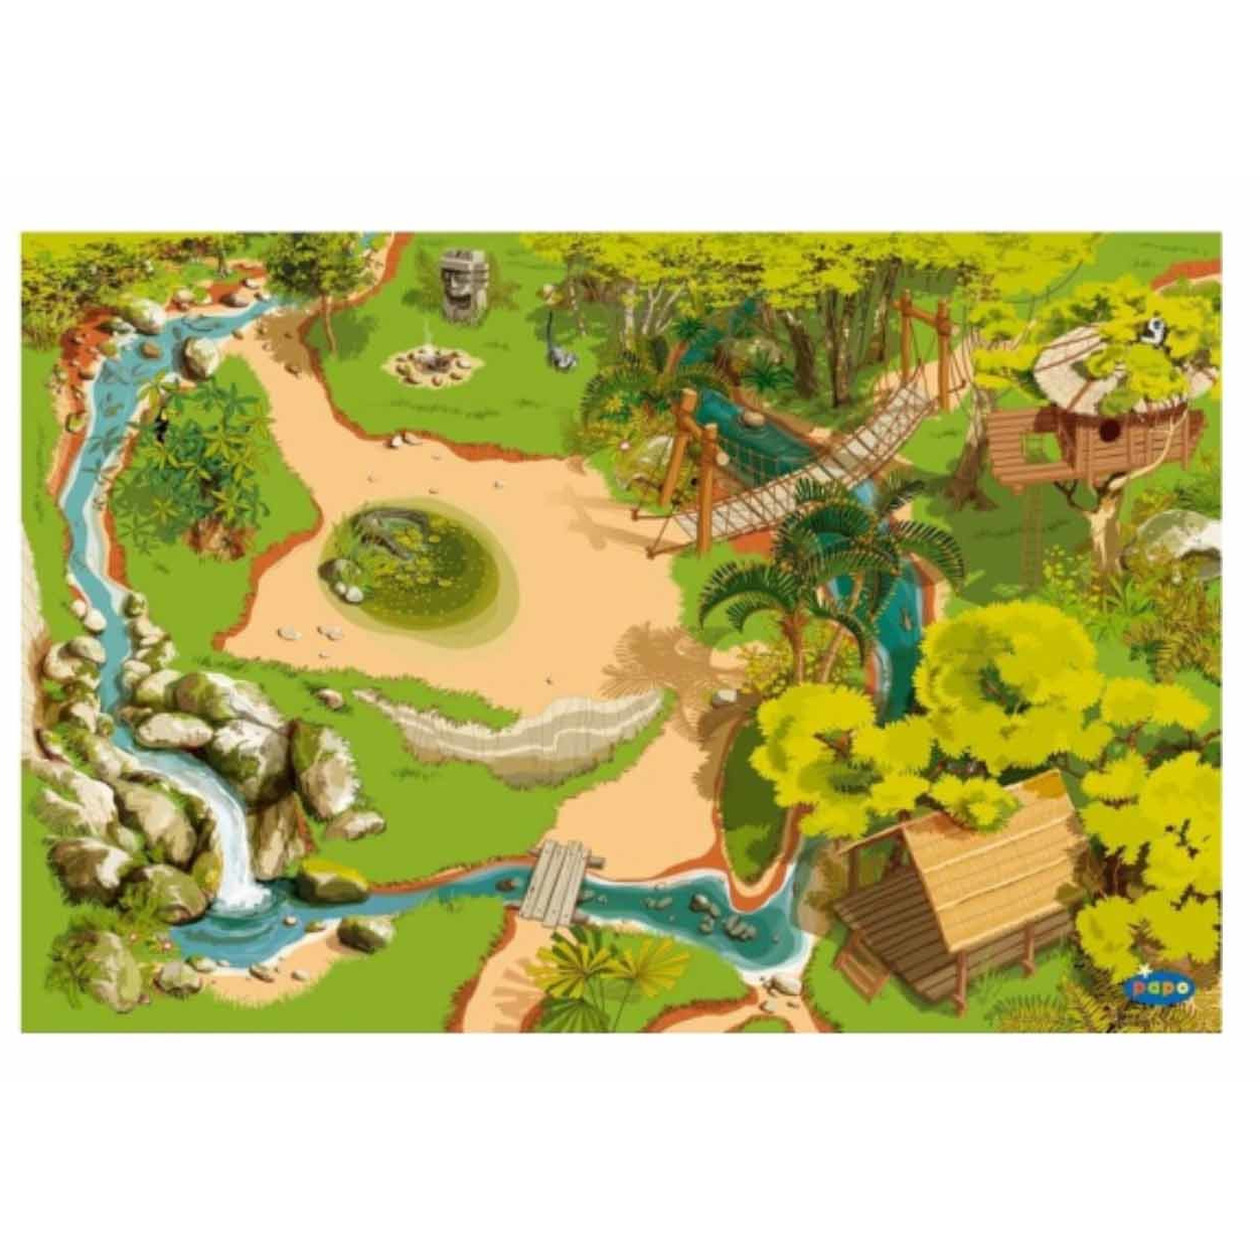 Speelkleed Jungle 95 x 135 cm